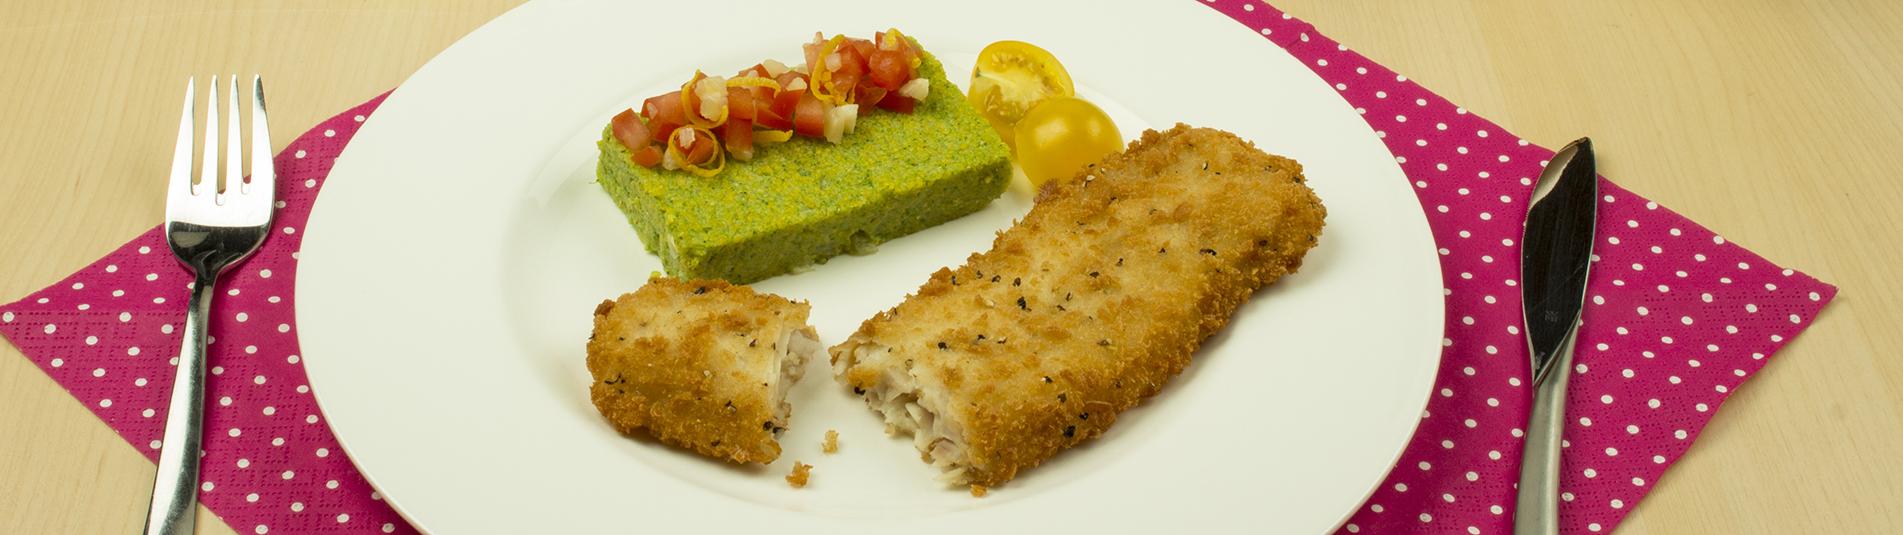 Iglo Ofenvariation mit Polenta Spinat